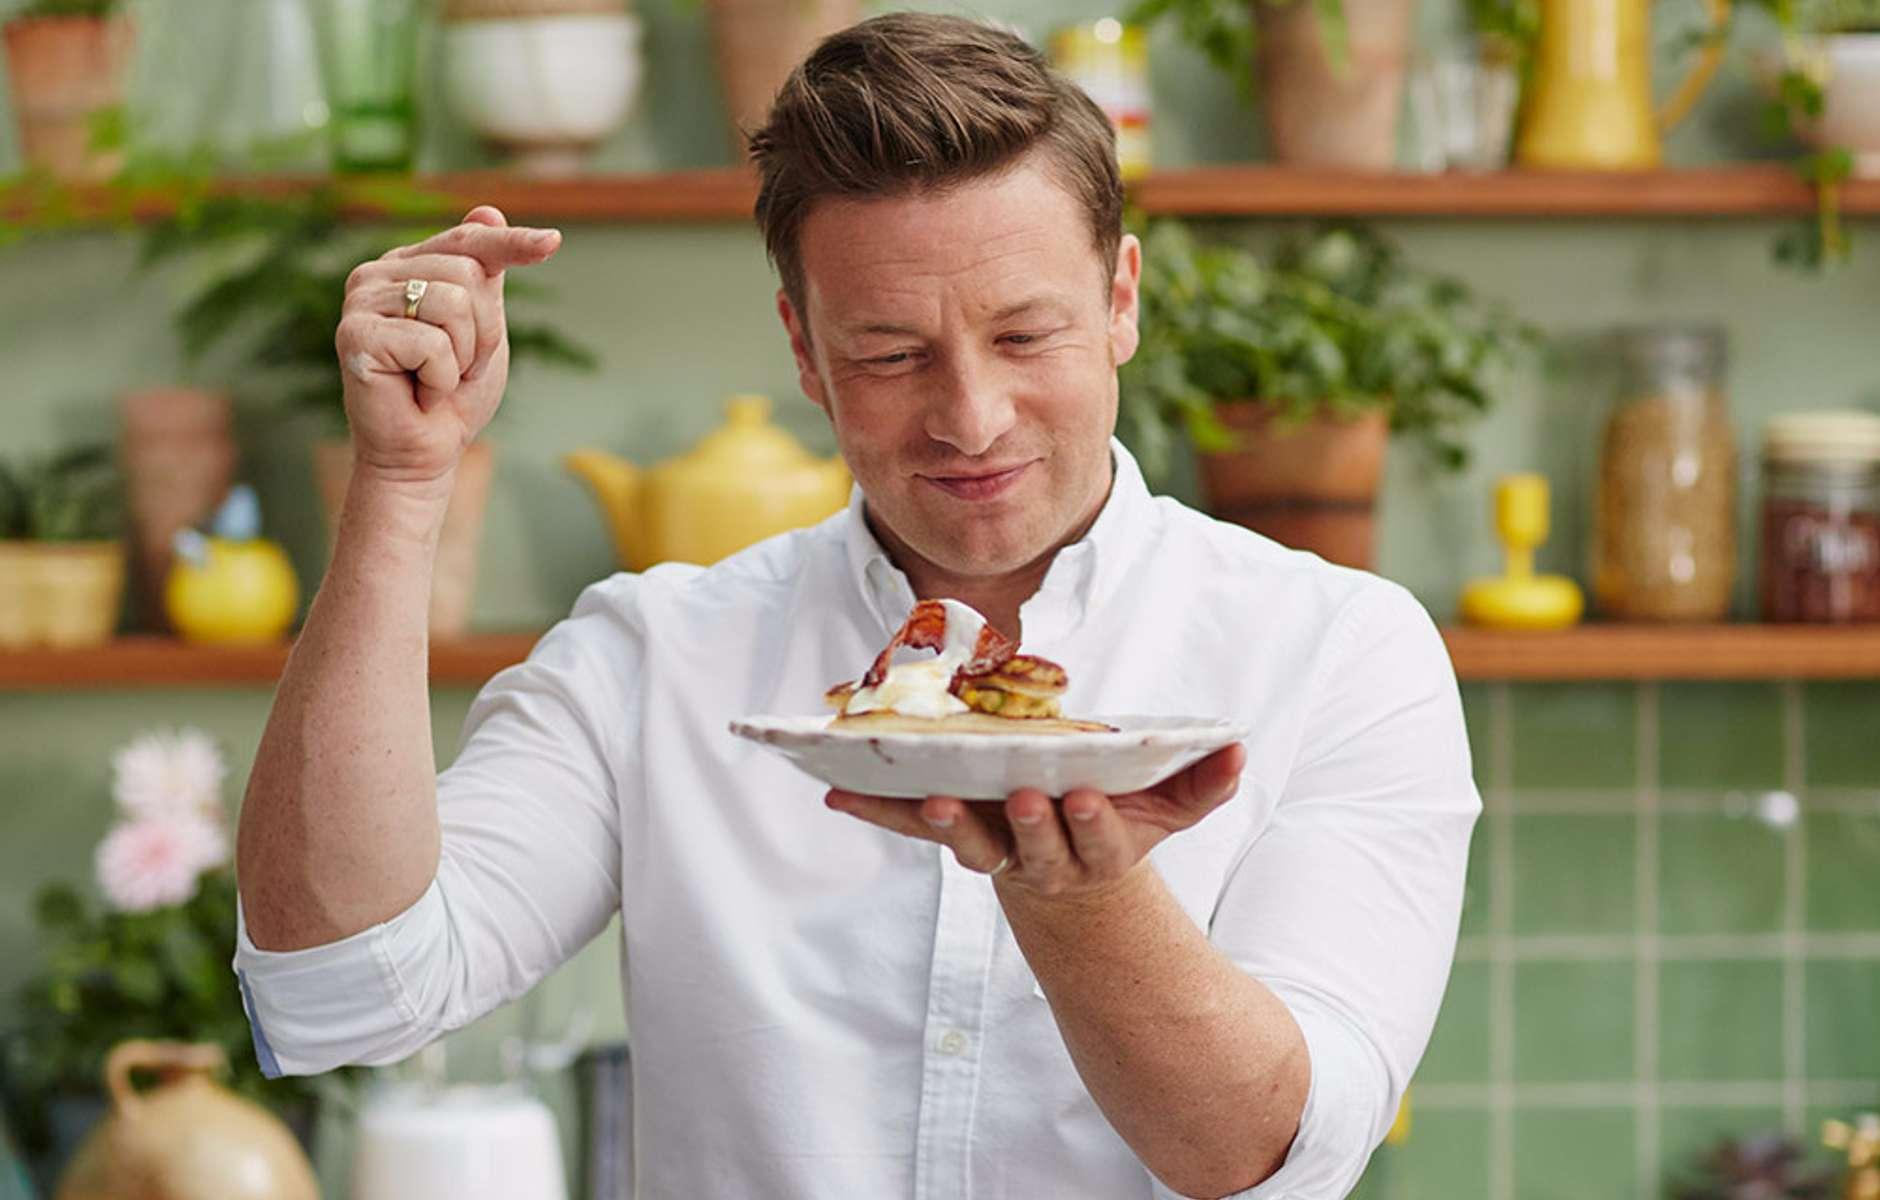 повар жоаким соуза рецепты и фото блюд сейчас многих